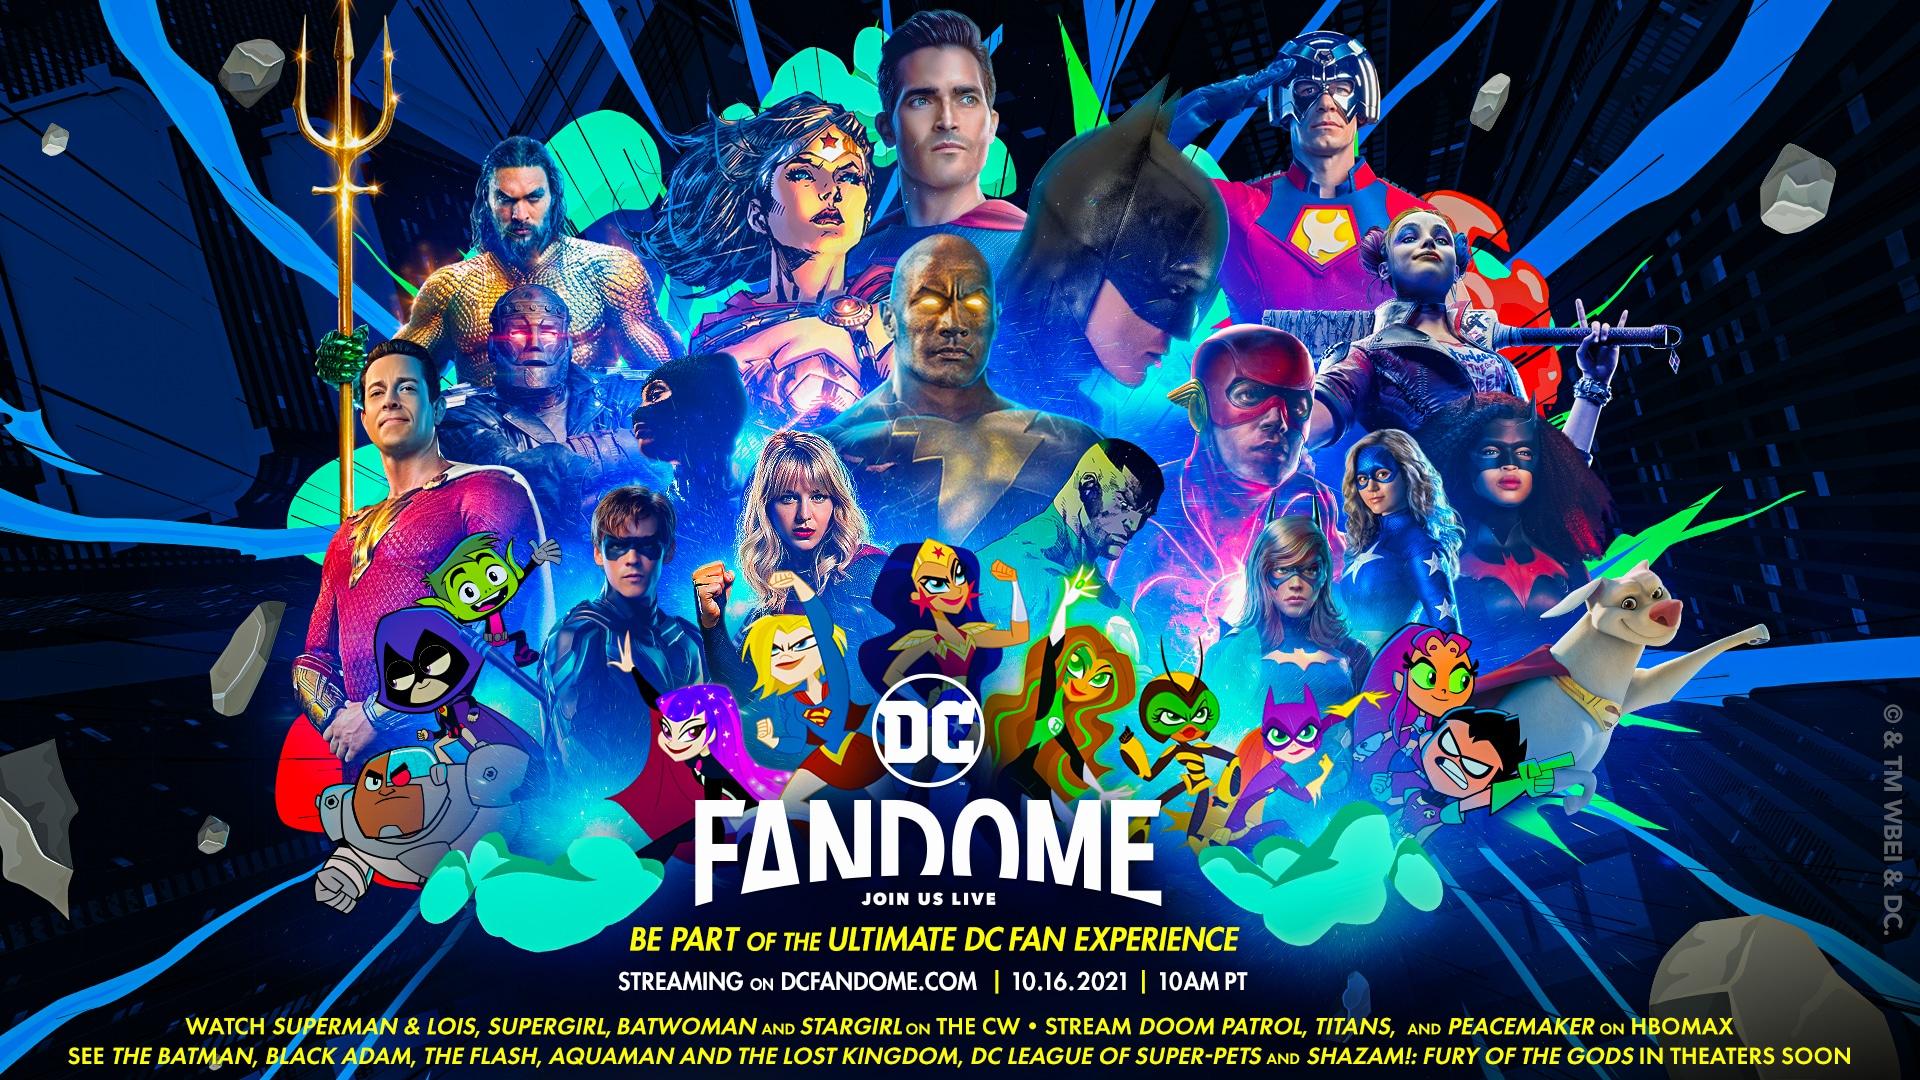 DC Fandome Stream